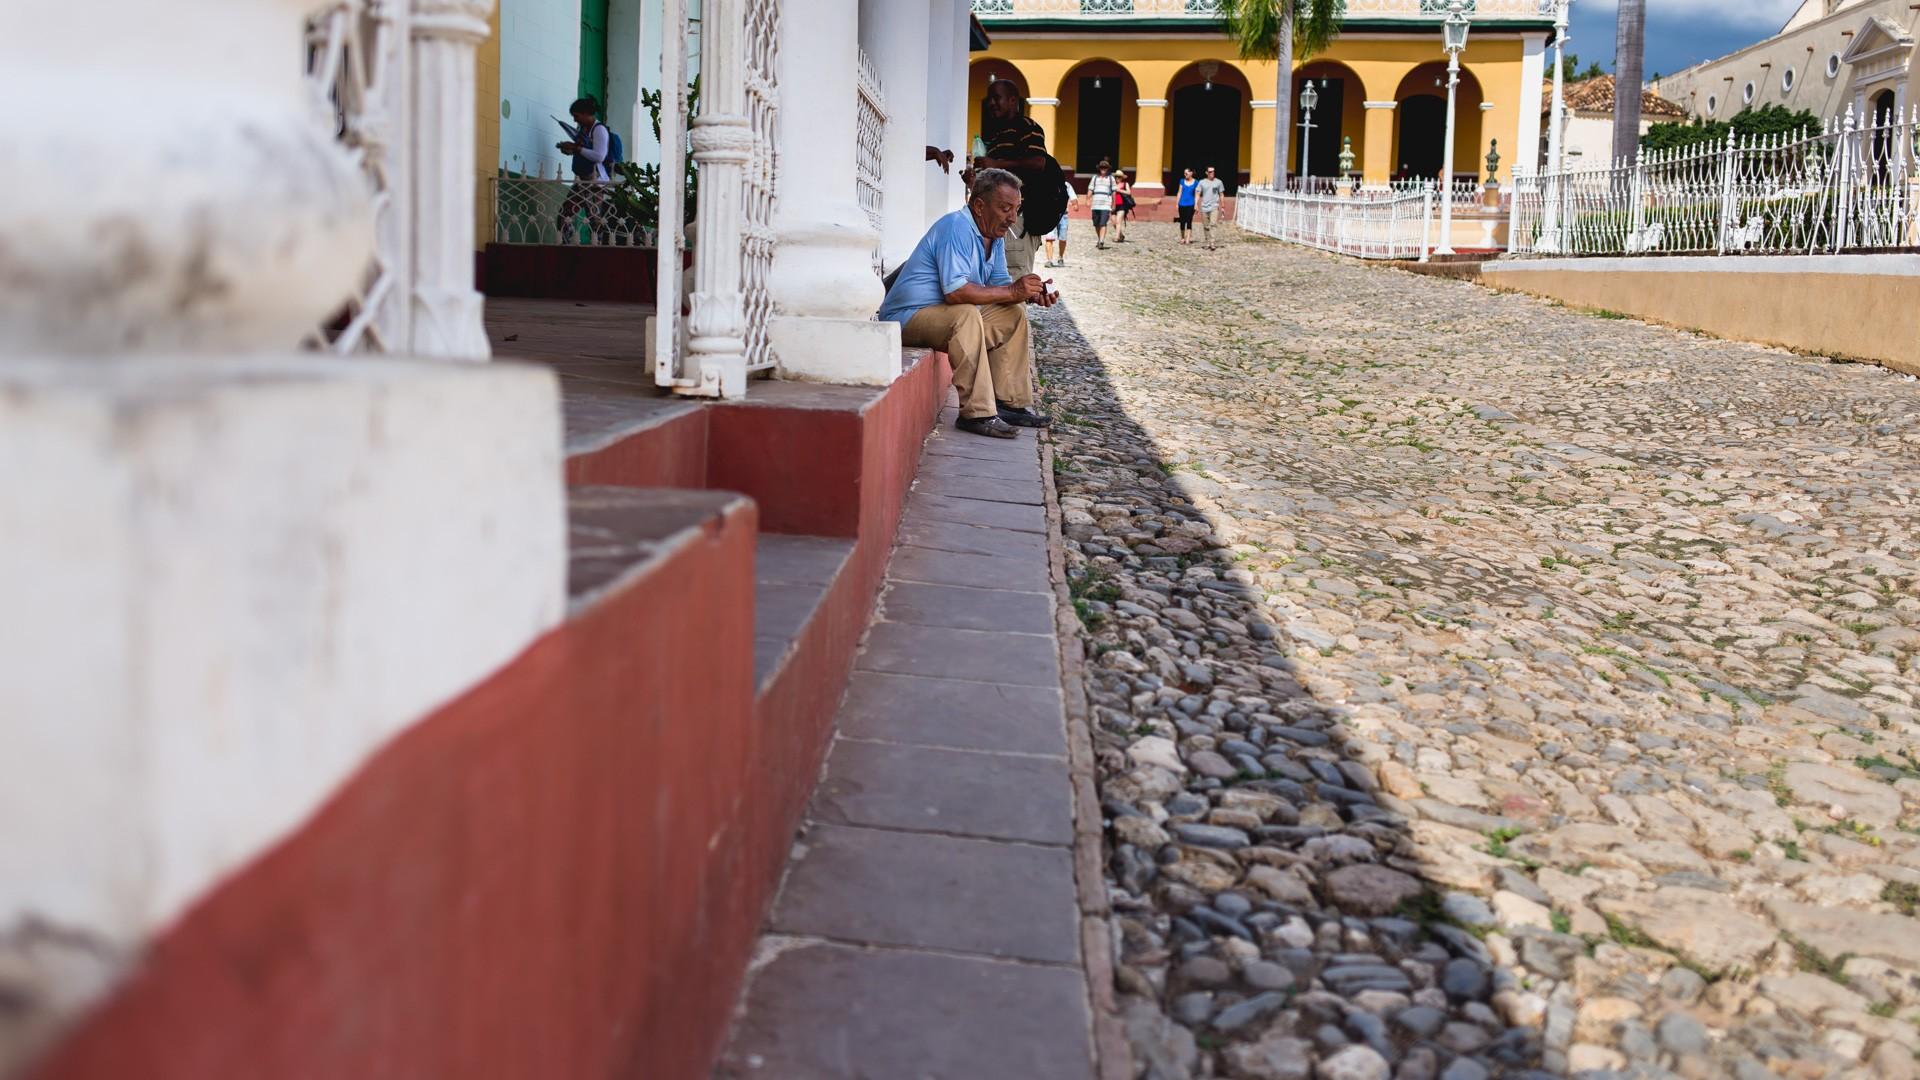 Damien-Dohmen-Photographe-Cuba-28